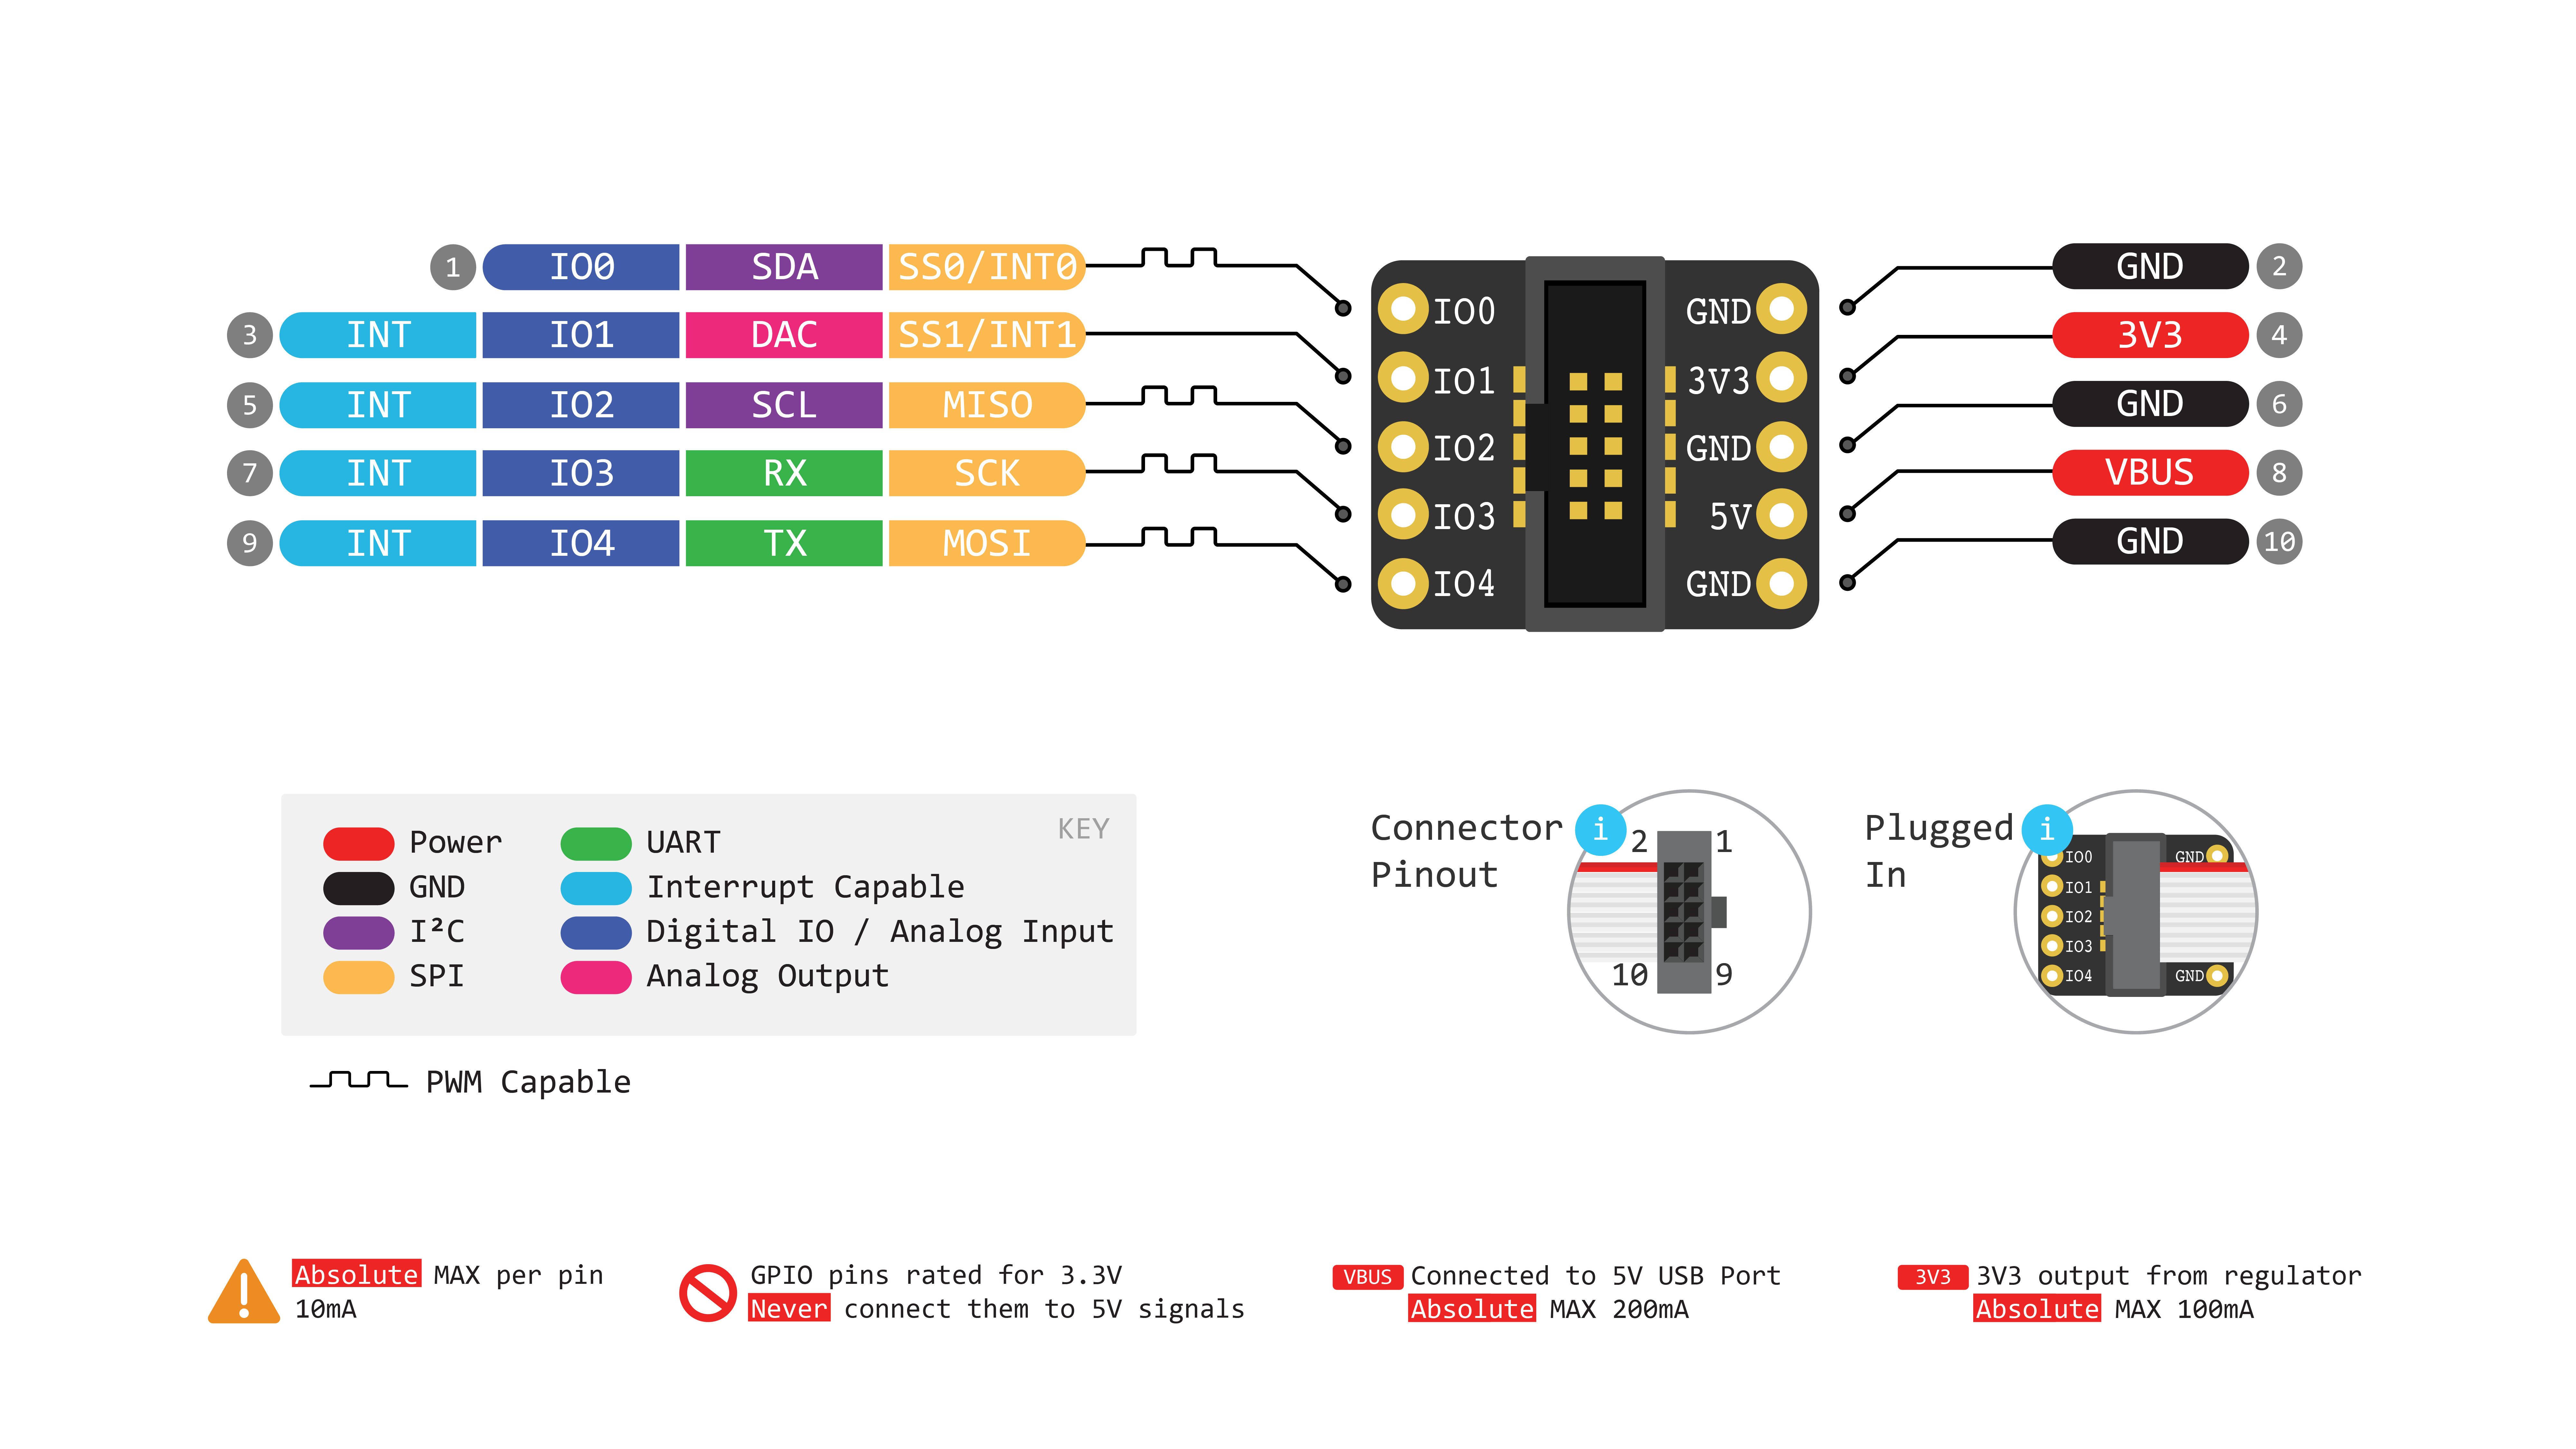 sensors_binho_pinout_graphic.png